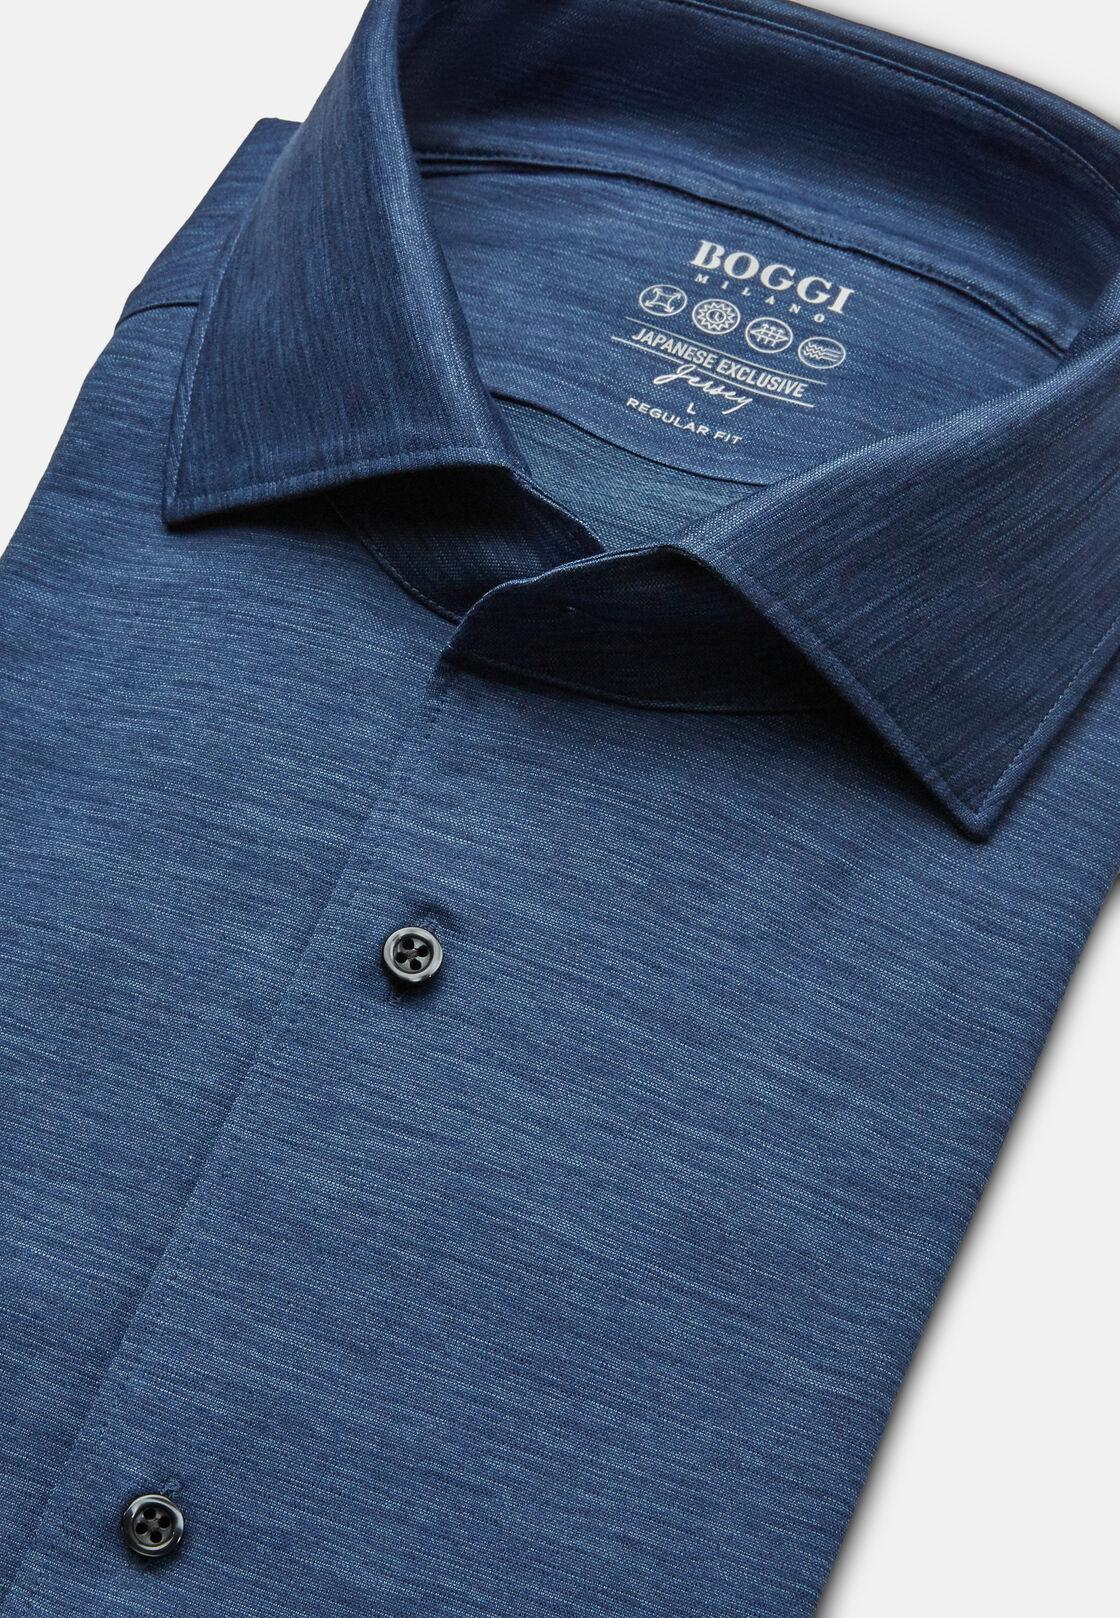 Polohemd aus japanischem jersey regular fit, Indigo, hi-res